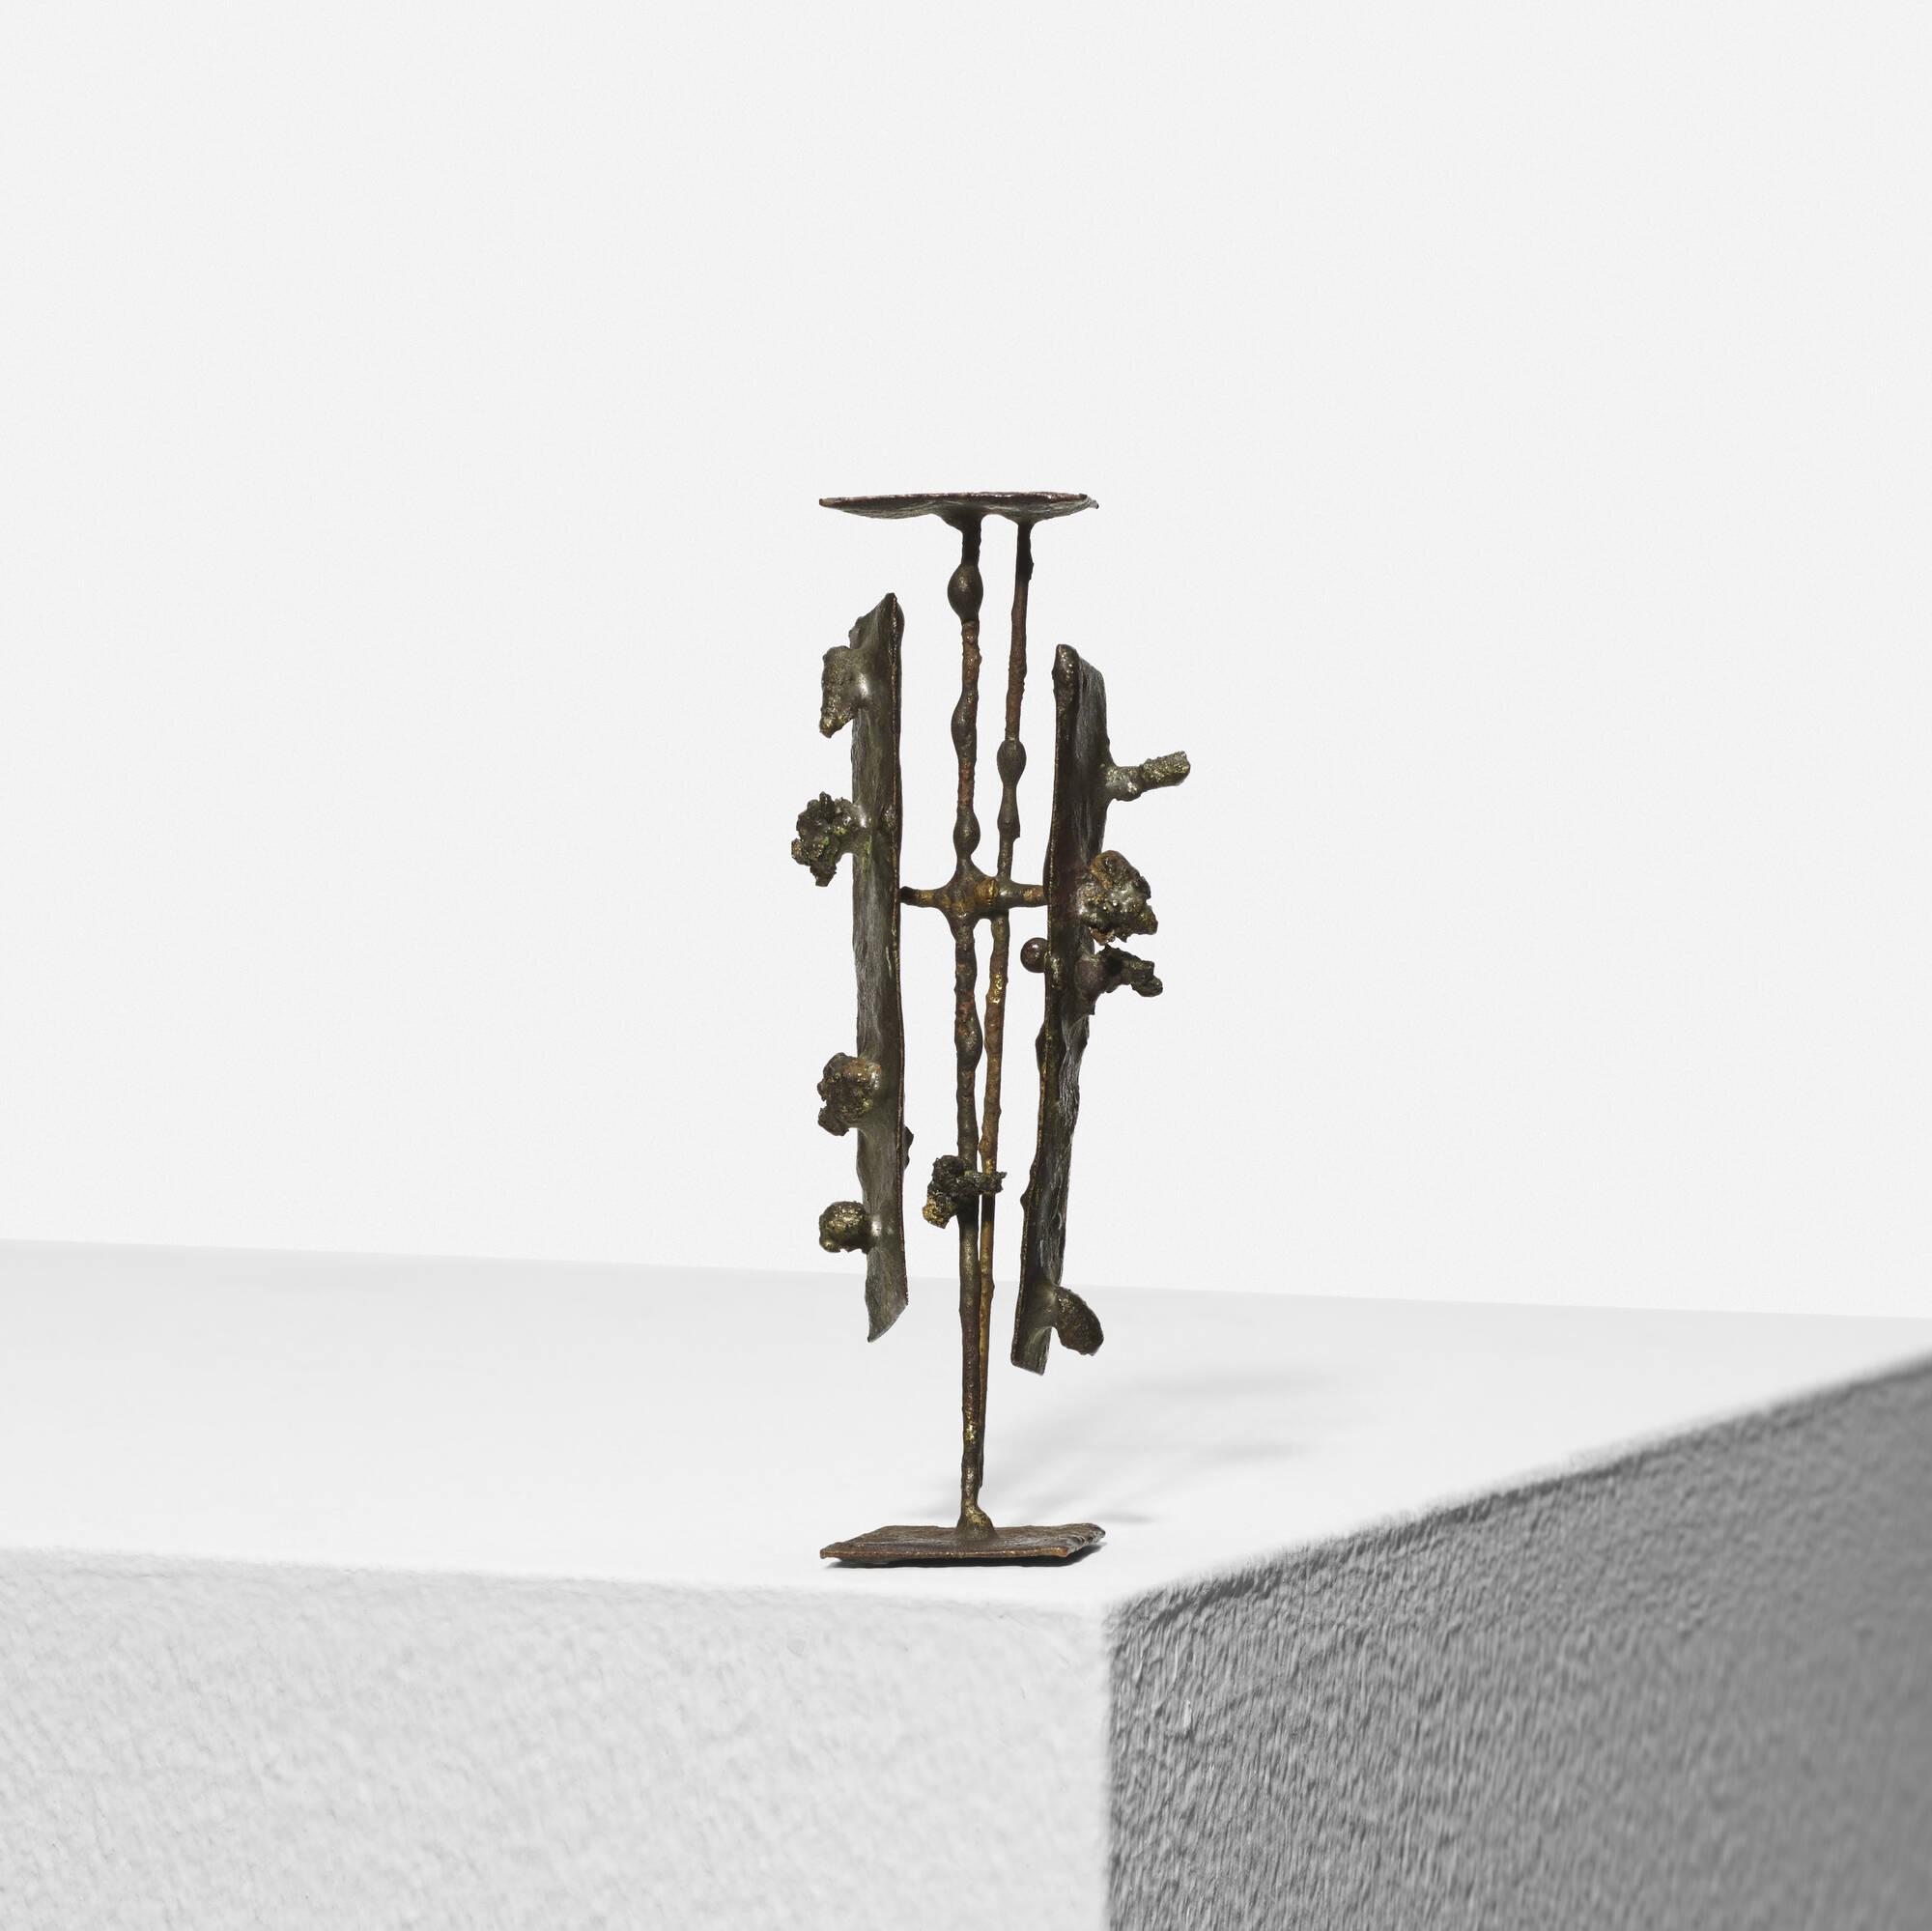 109: Harry Bertoia / Untitled (Welded Form) (1 of 2)